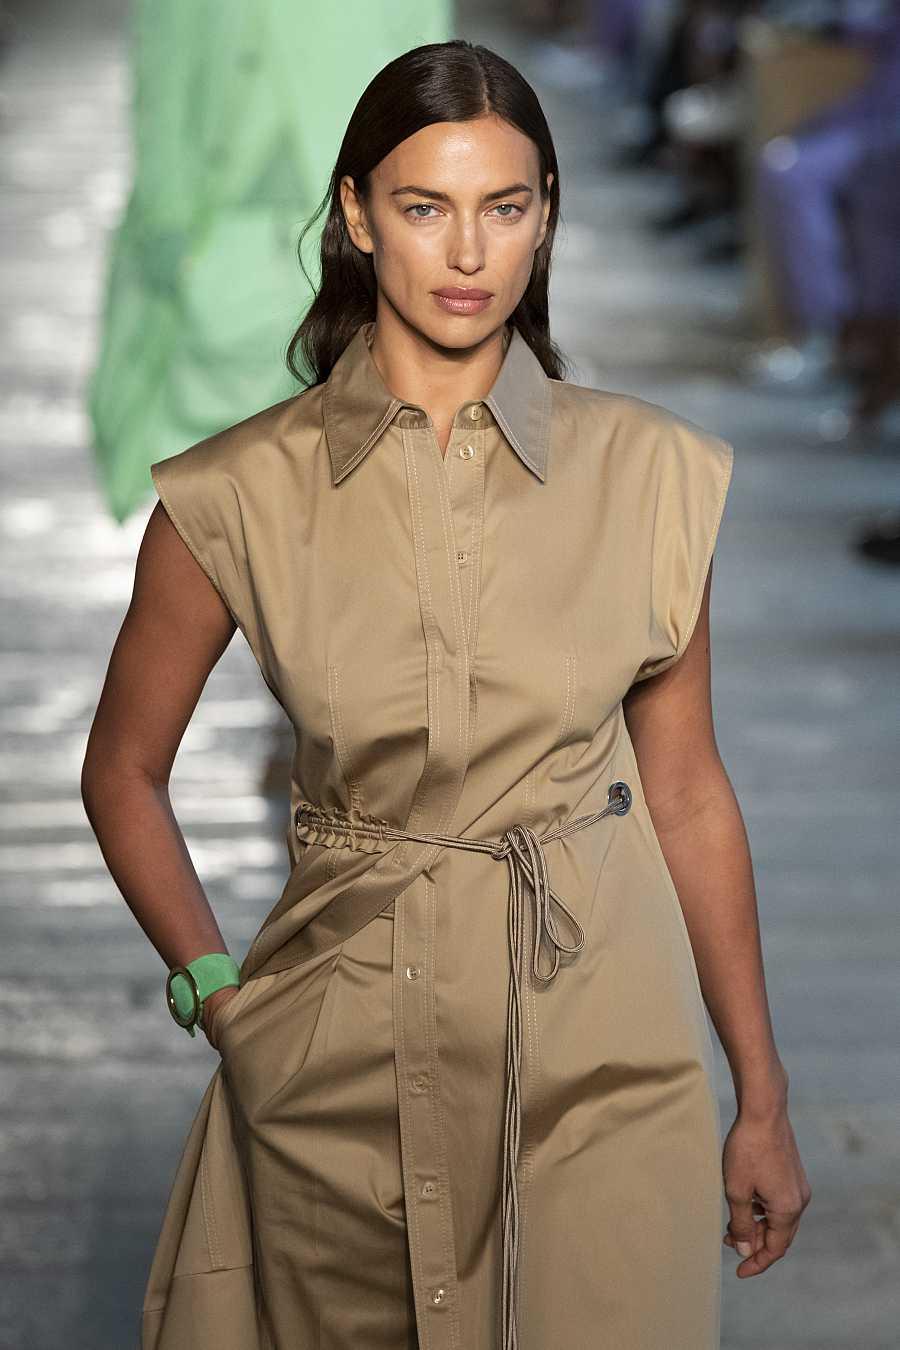 Irina Shayk en el desfile de Boss en la Milan Fashion Week